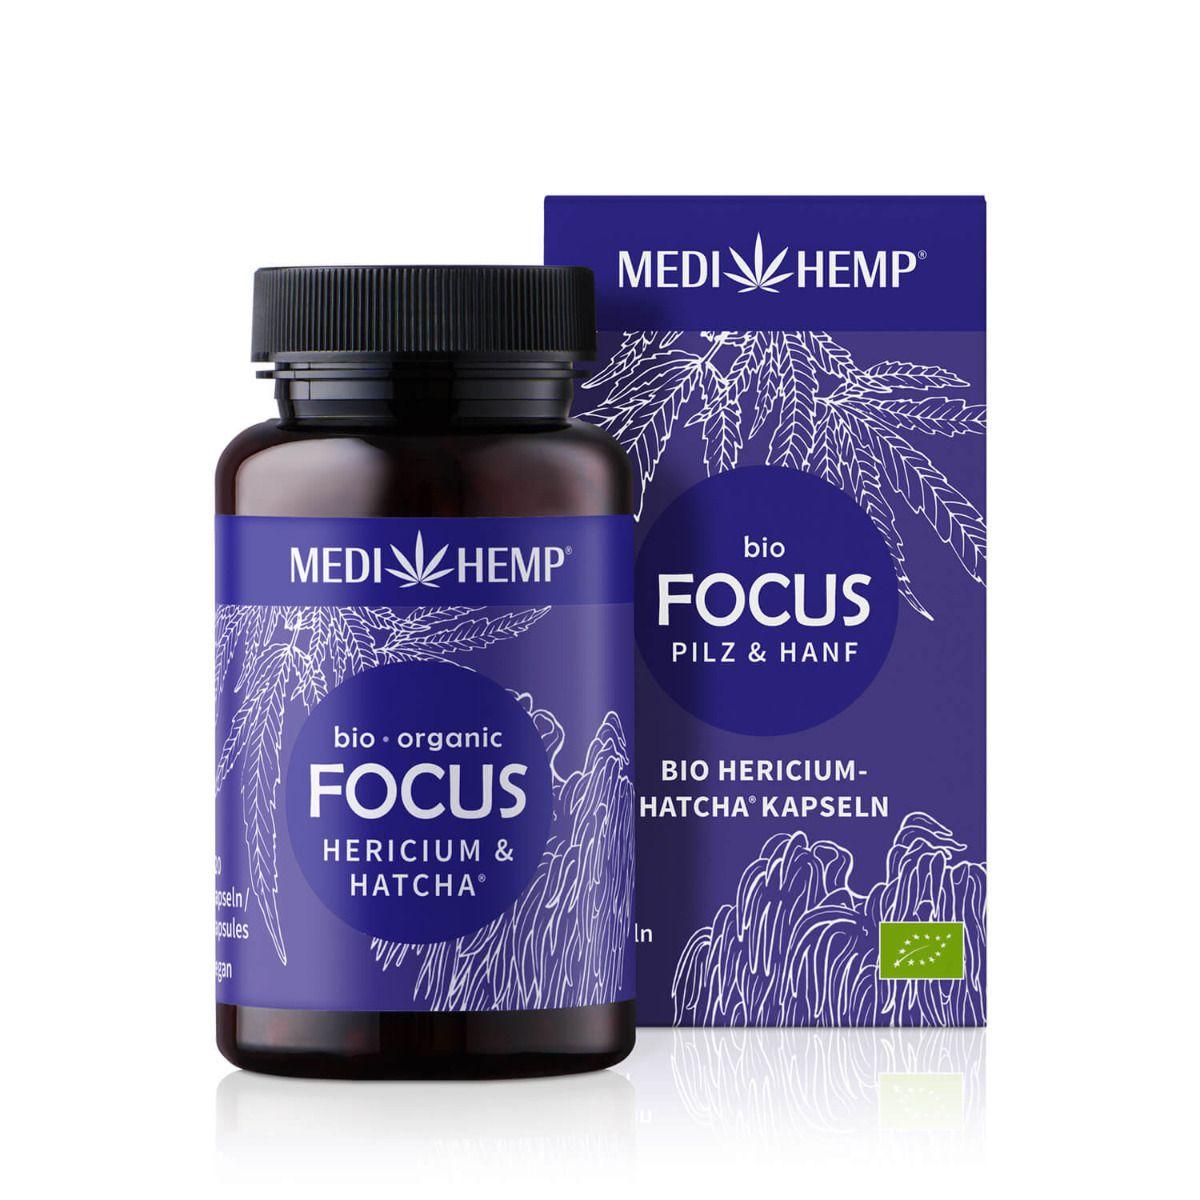 Bio FOCUS Hericium-HATCHA®, 120 Kapseln, vegan